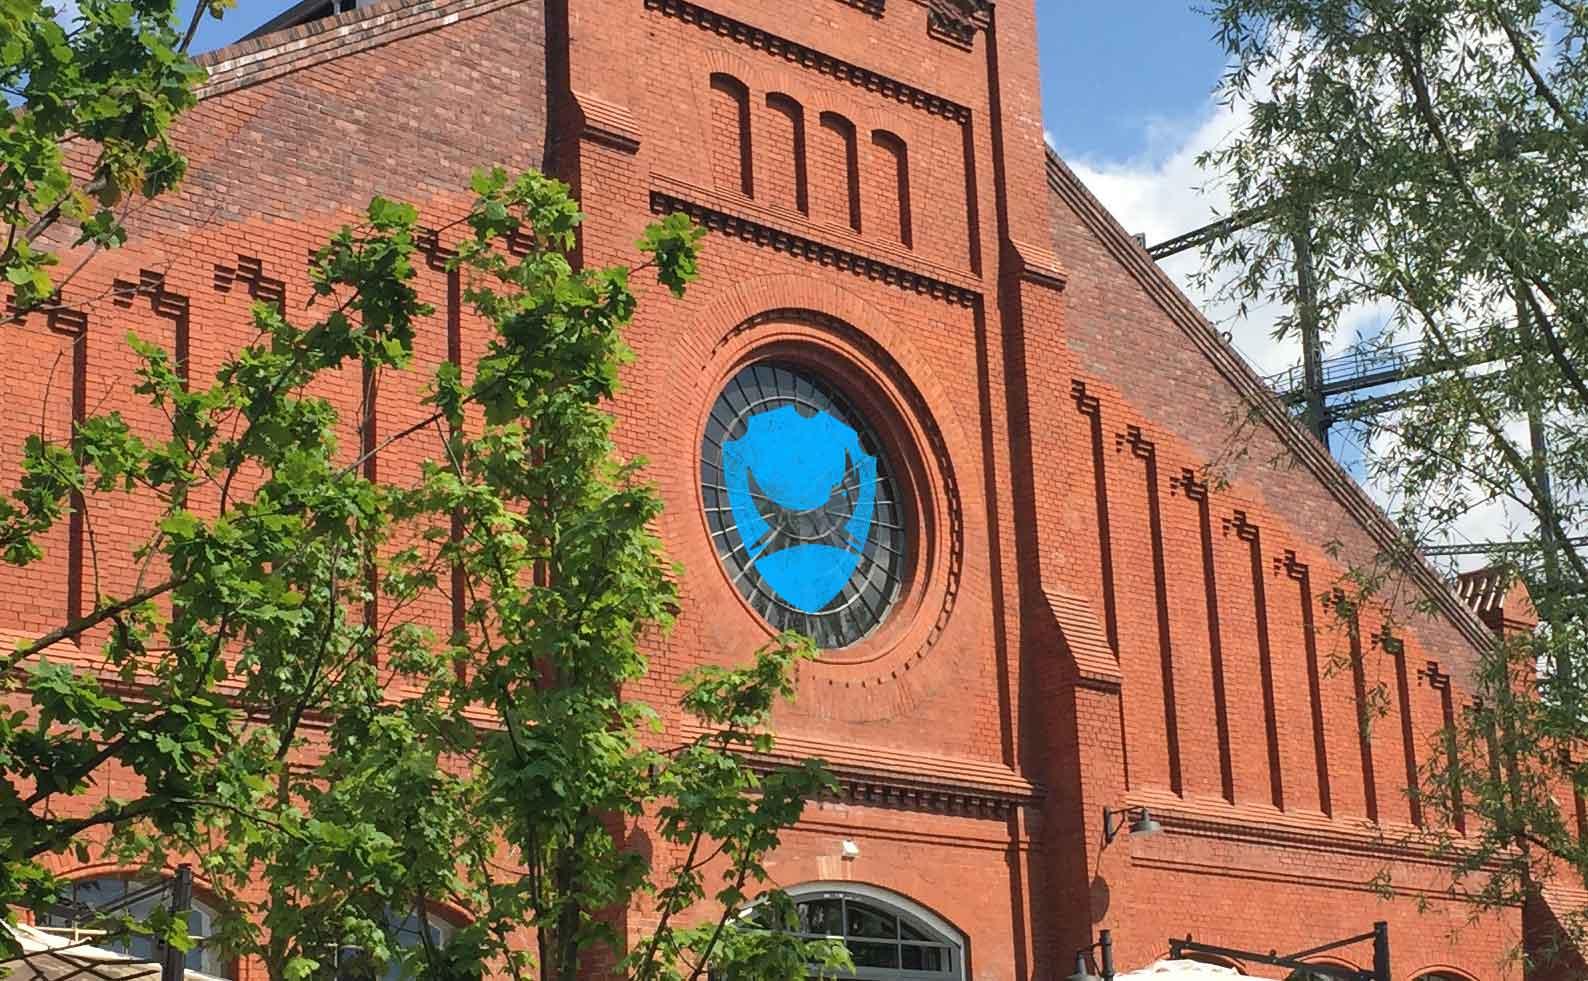 Stone Brewing übergibt Standort Berlin Marienfeld an Brewdog